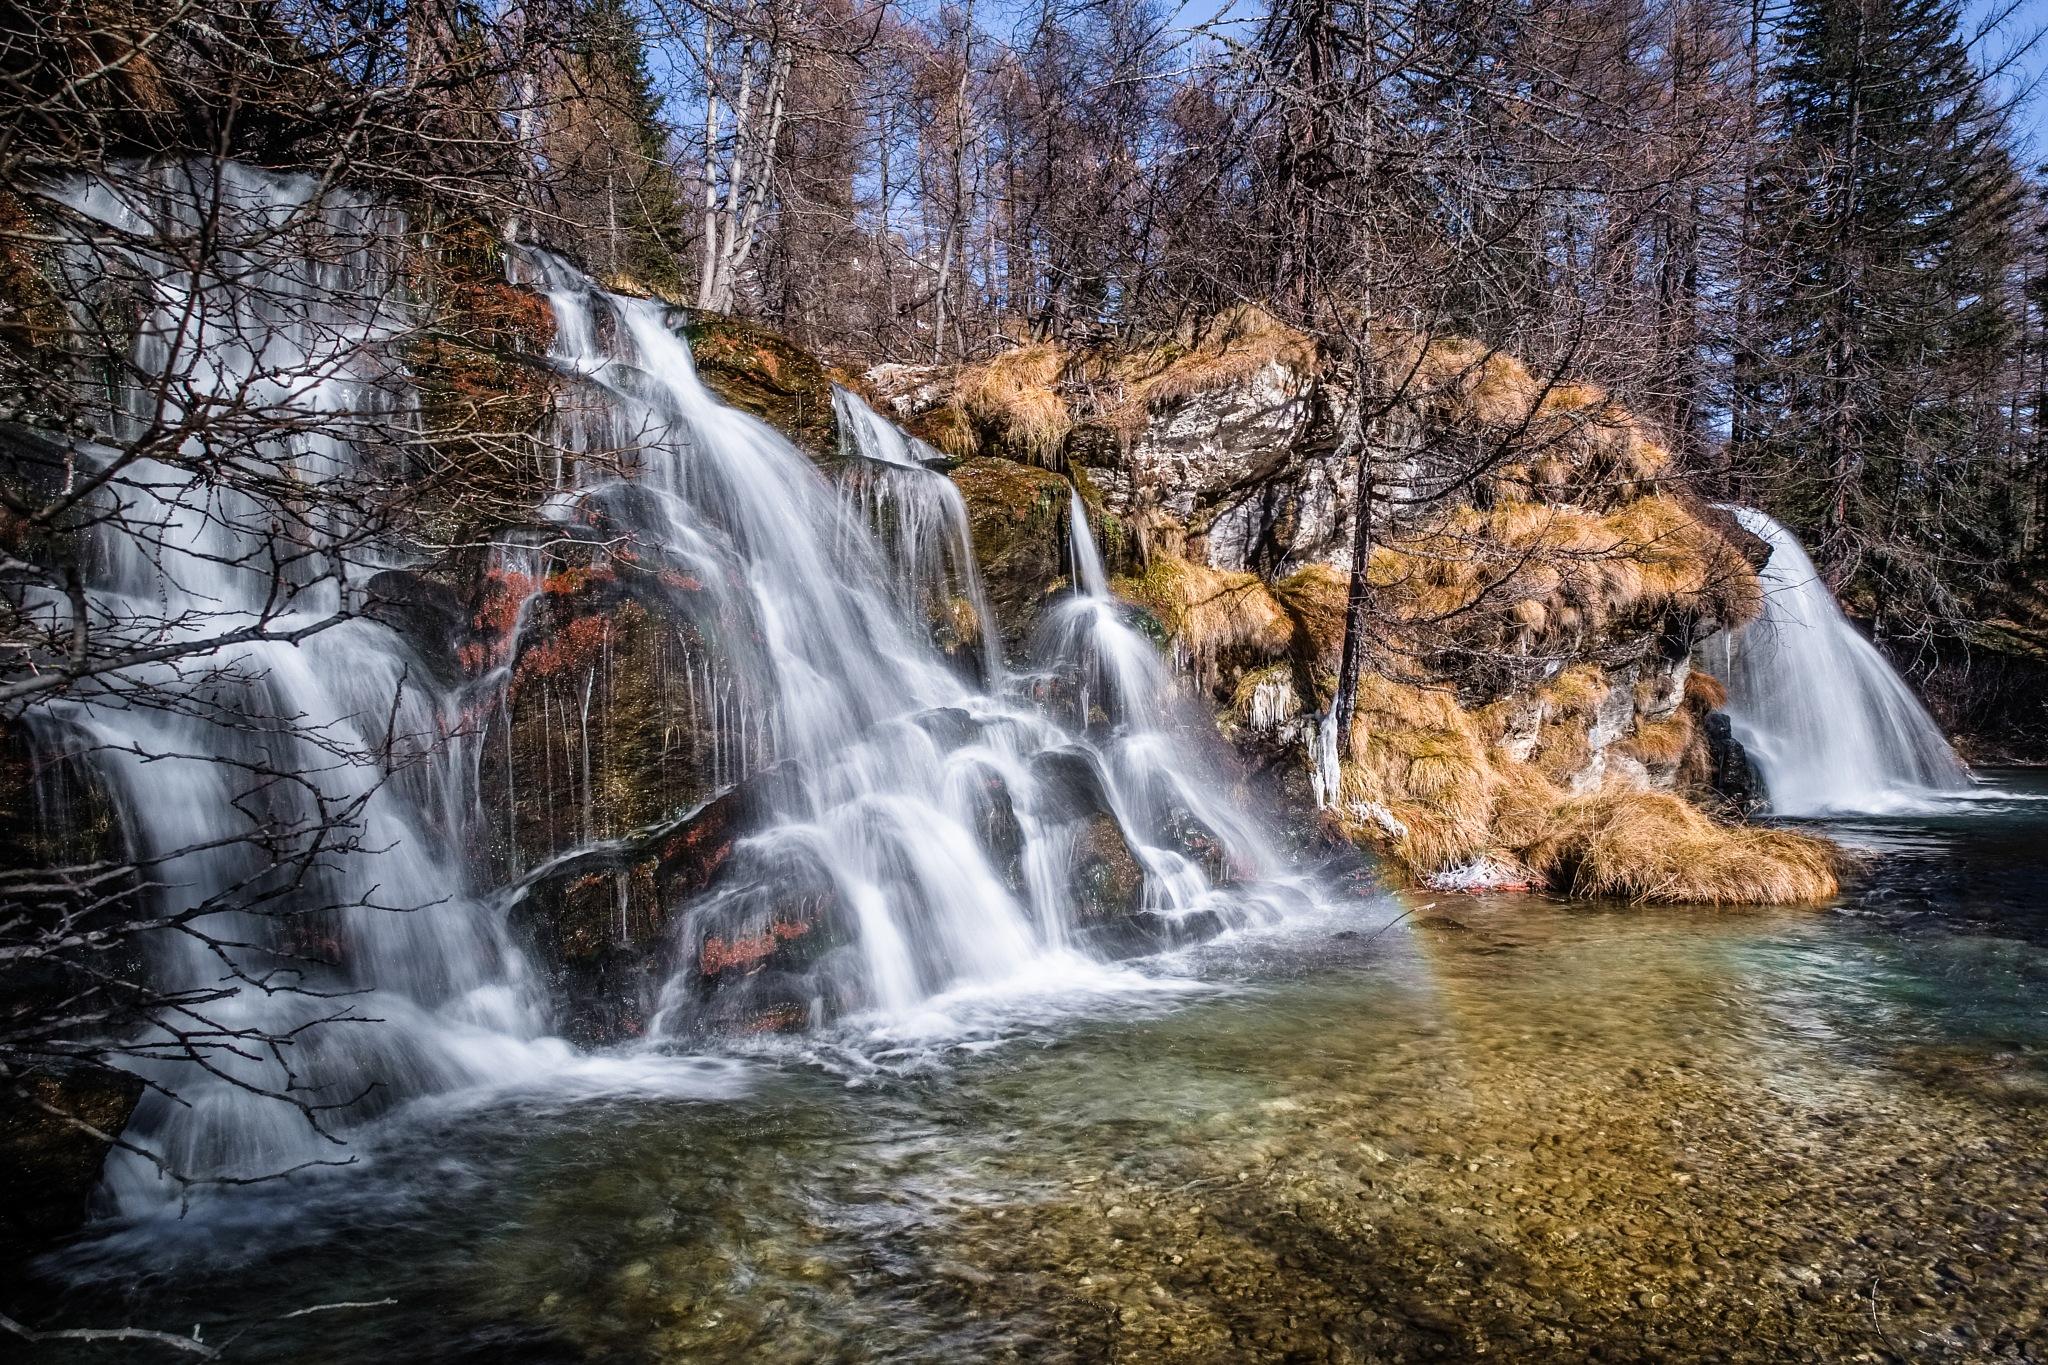 Alpe Devero Falls by Paul Newman